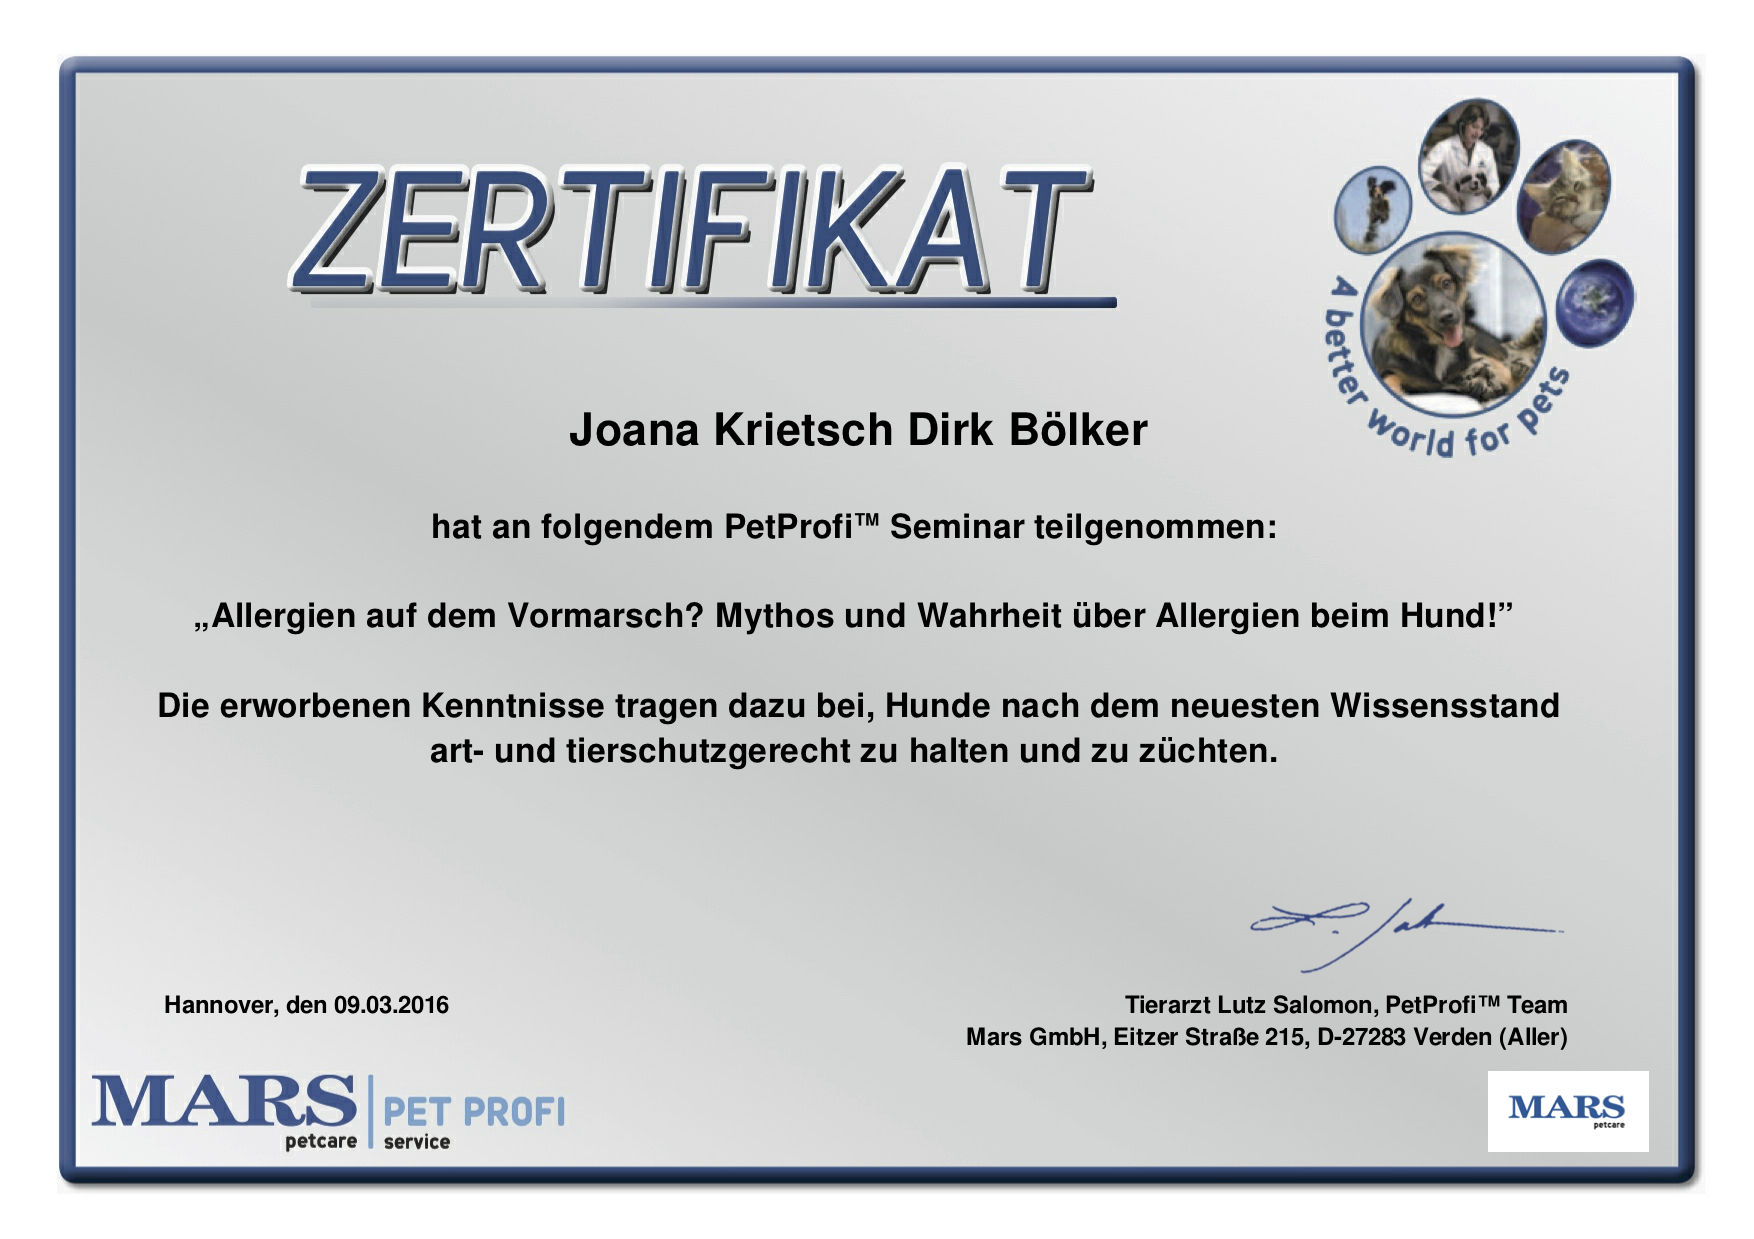 20180605-124854_Zertifikat